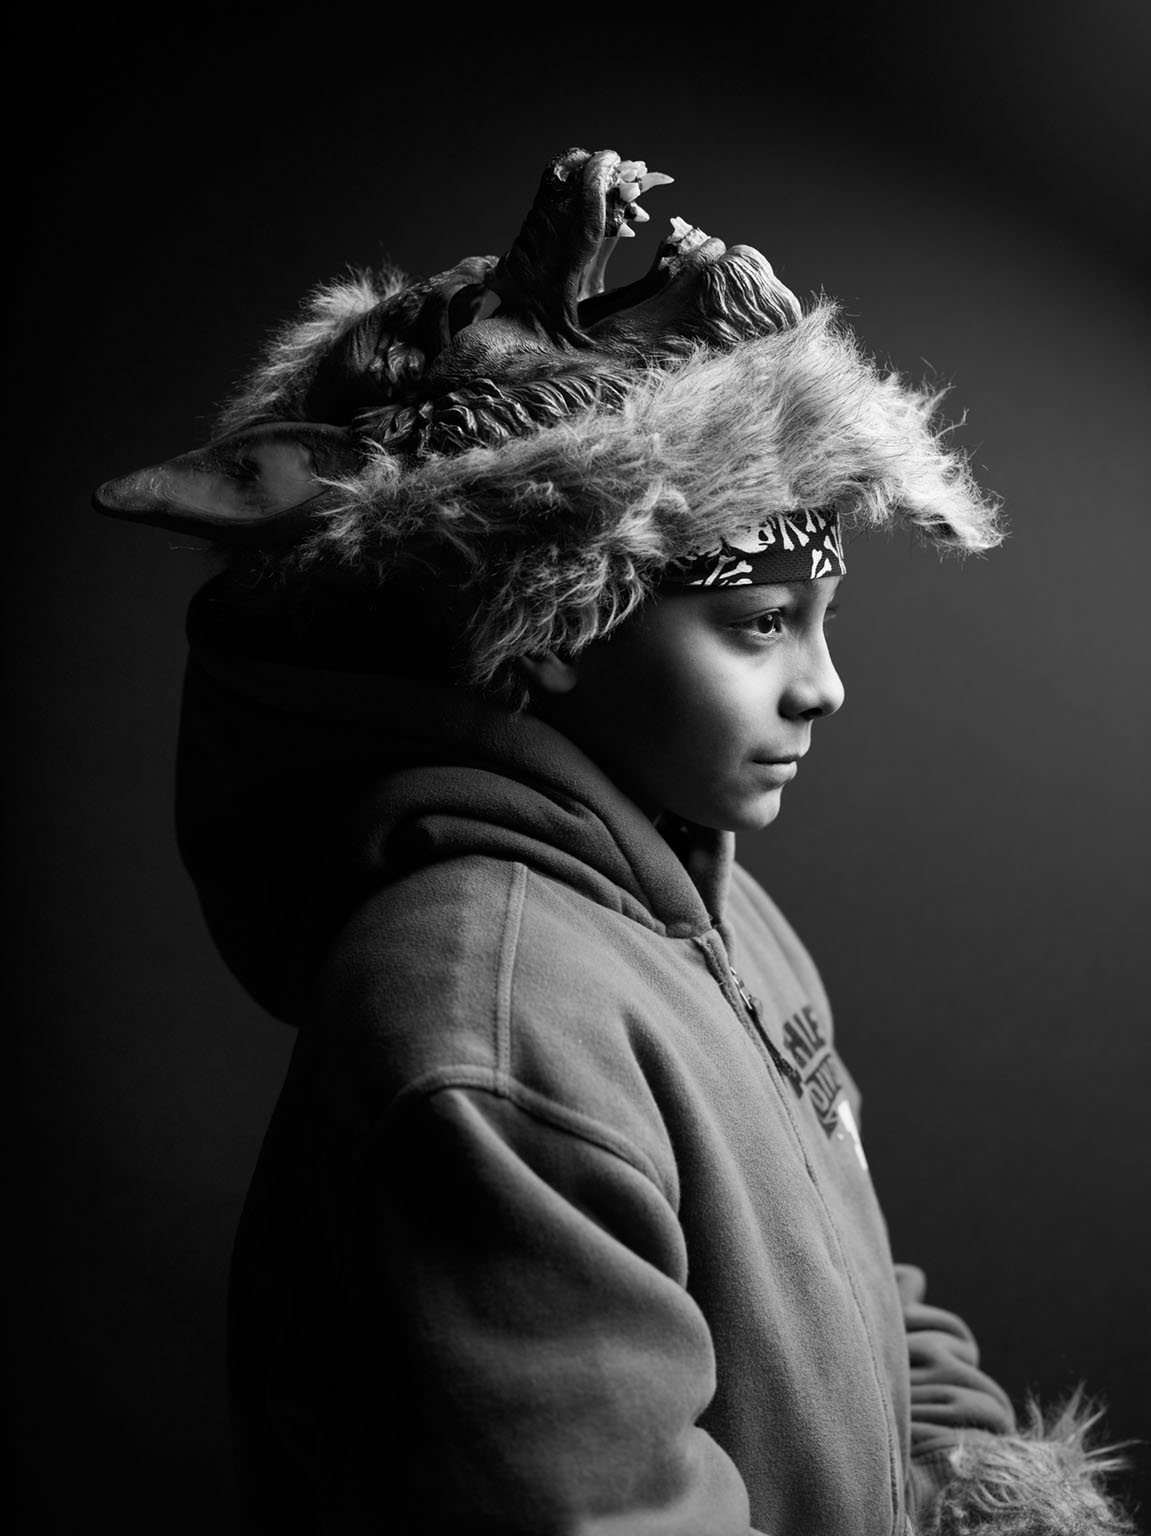 Joey lawrence photographer